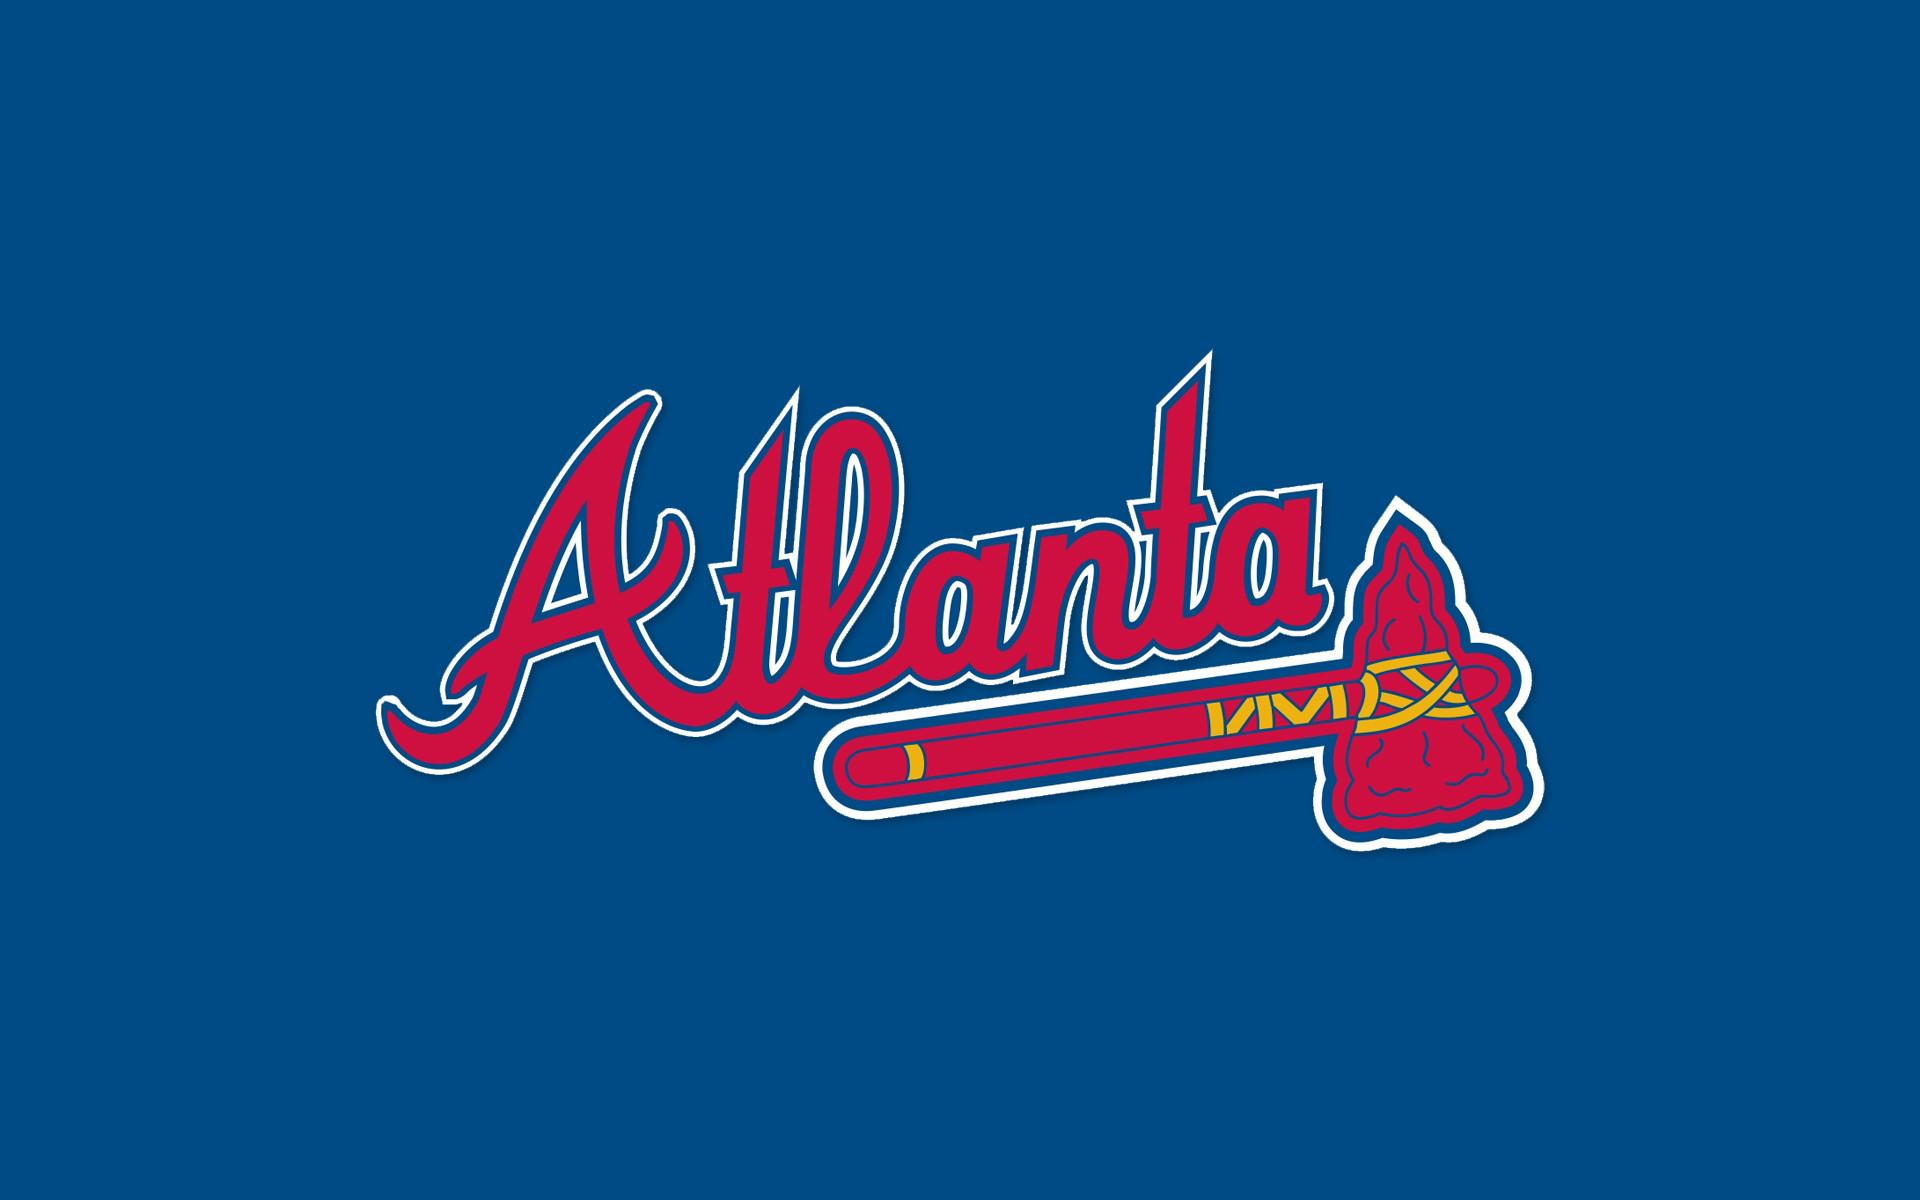 Amazing Atlanta Braves Wallpaper Wallpaper Desktop Atlanta Braves 825x550 Download Hd Wallpaper Wallpapertip